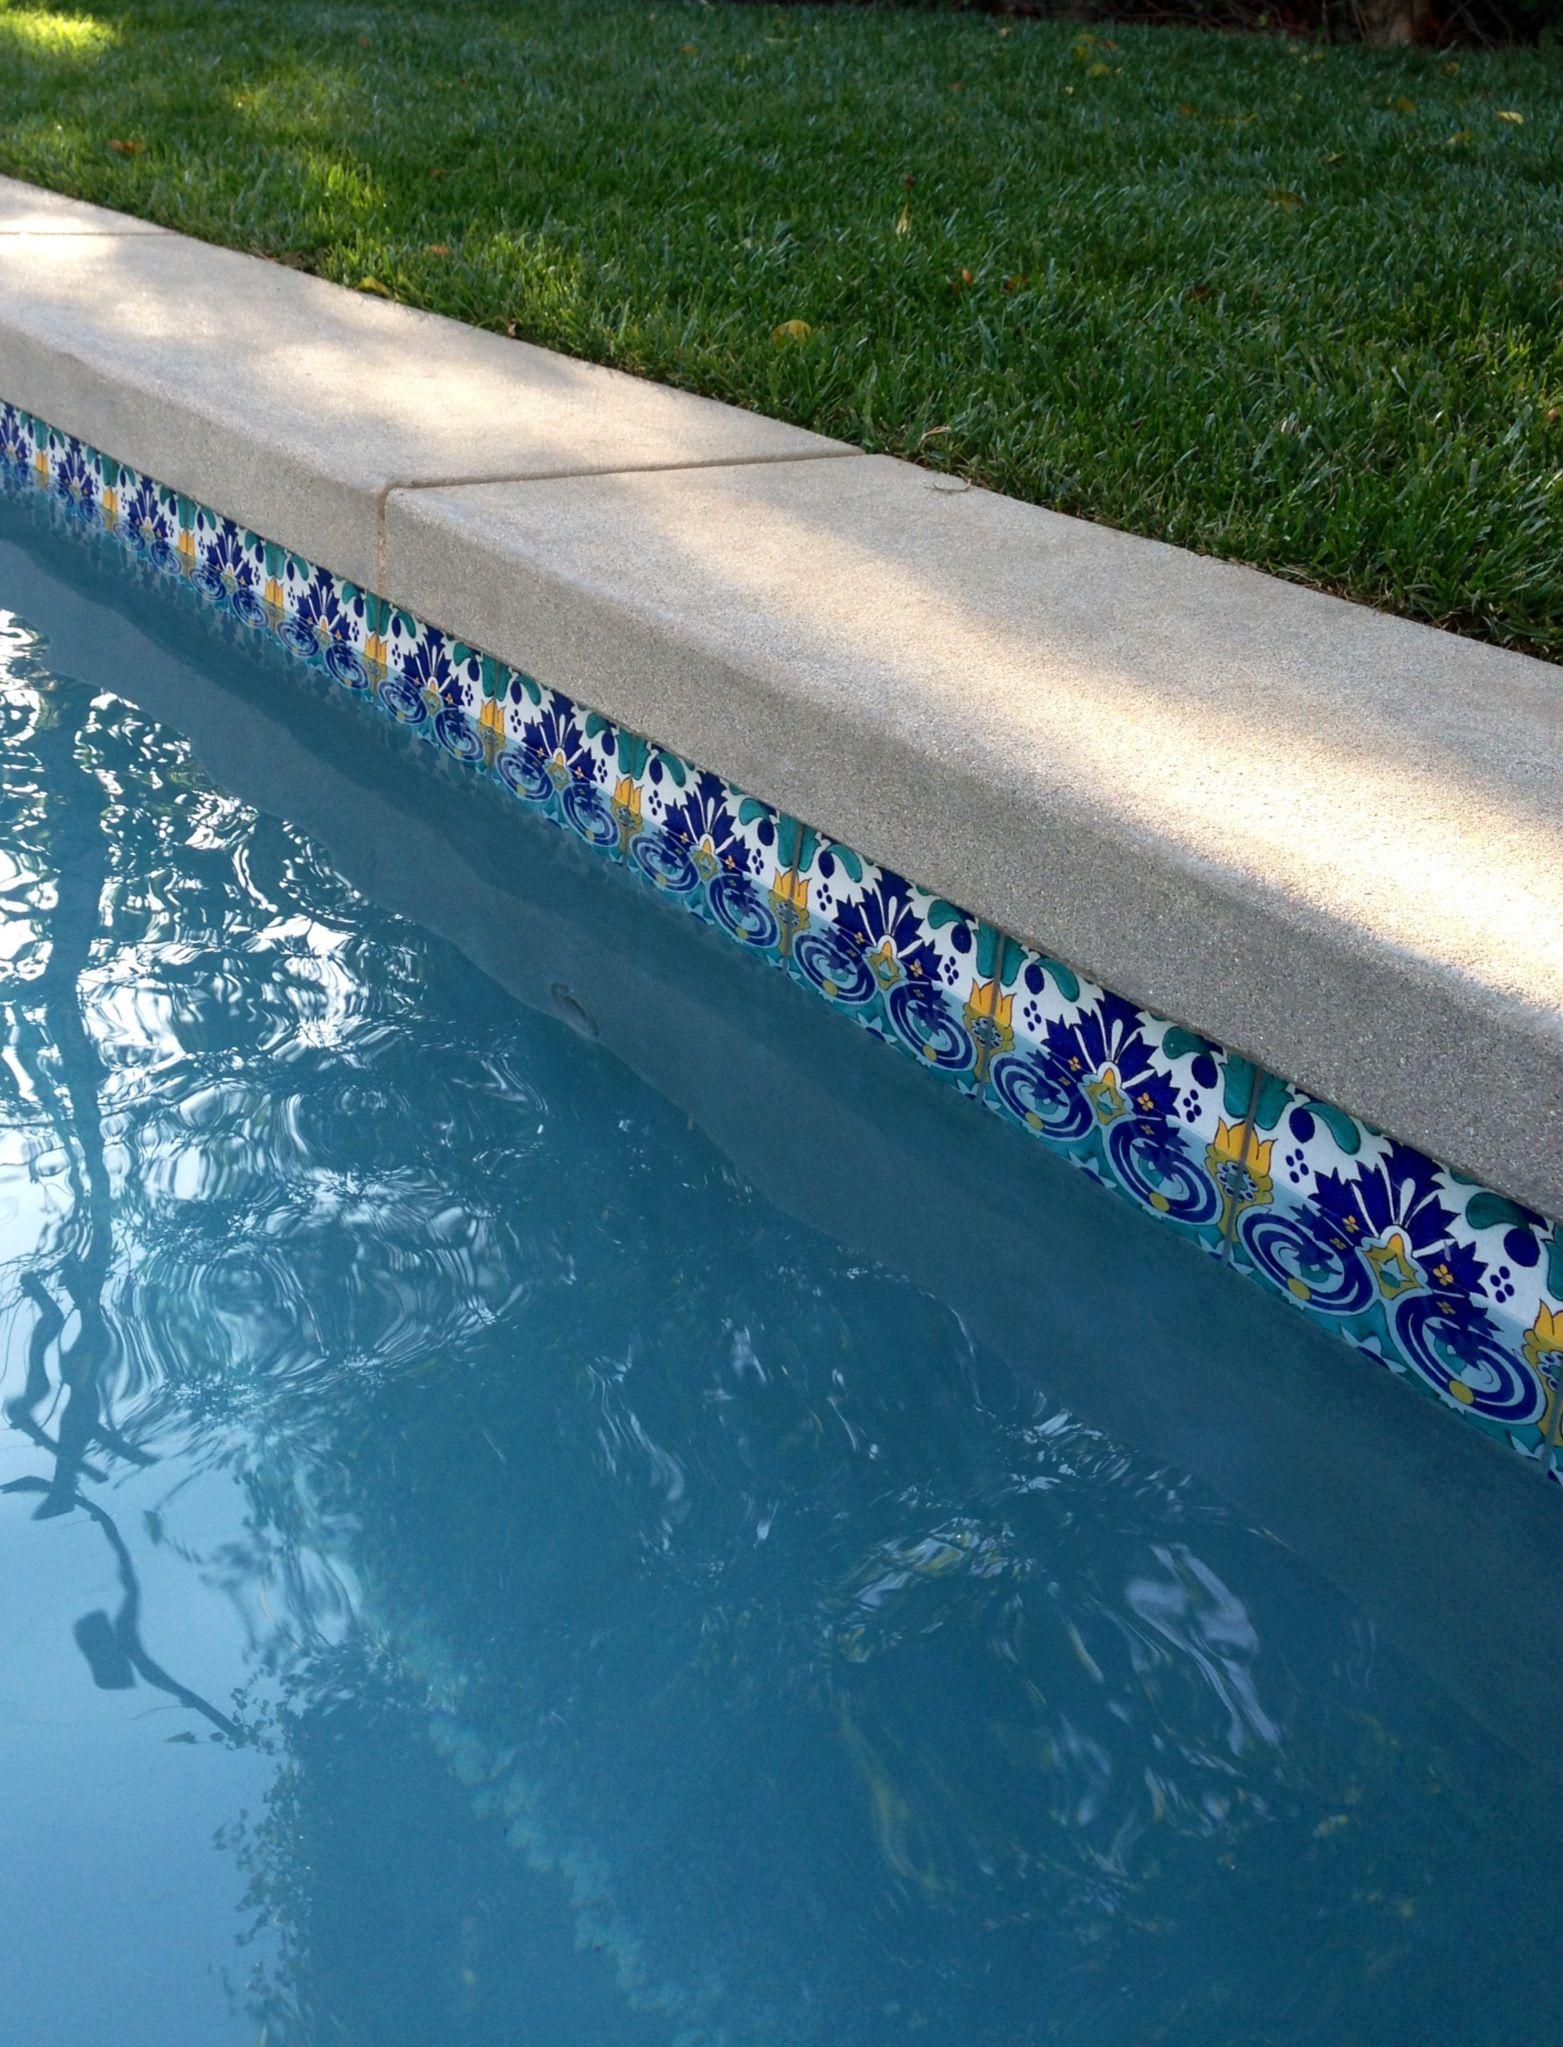 Garbo Pattern Tile At Pool Waterline Www Decorativepooltiles Com Swimming Pool Tiles Pool Tile Pool Landscape Design